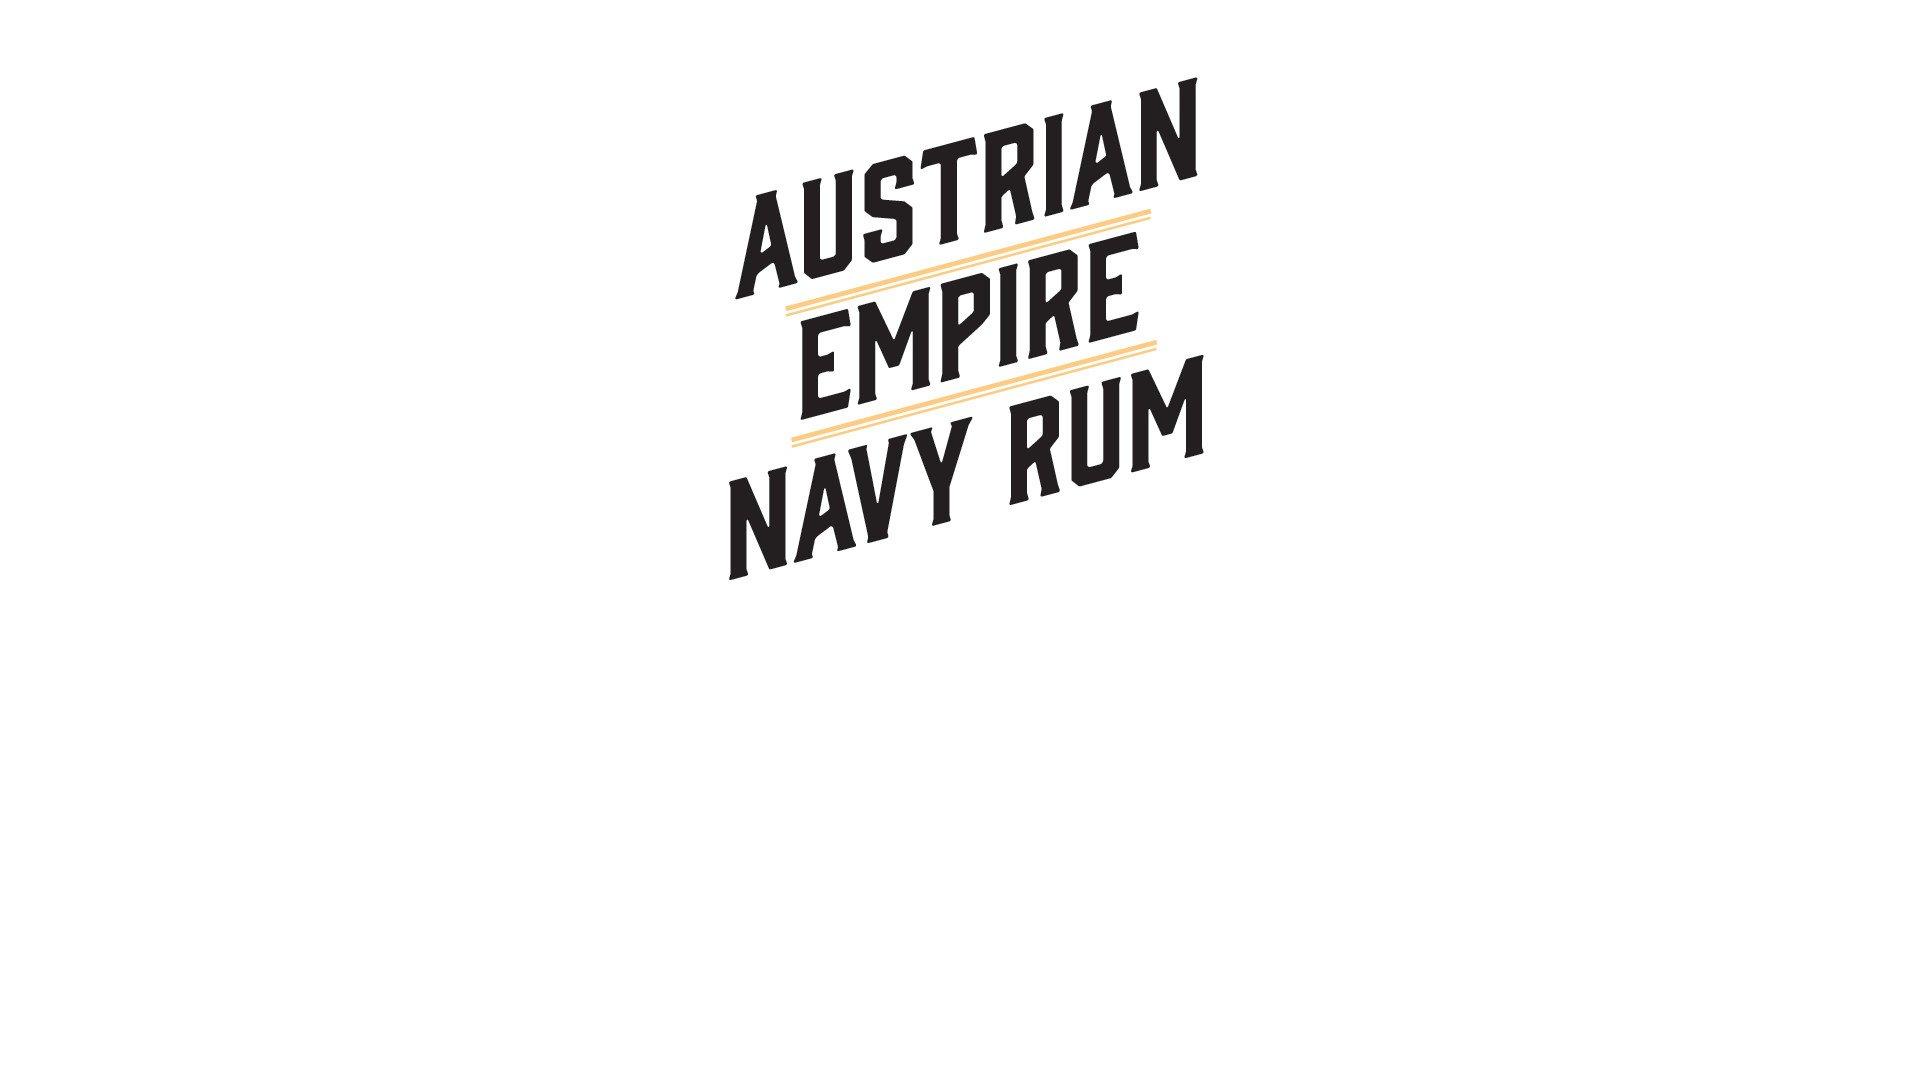 AUSTRIAN EMPIRE NAVY RUM